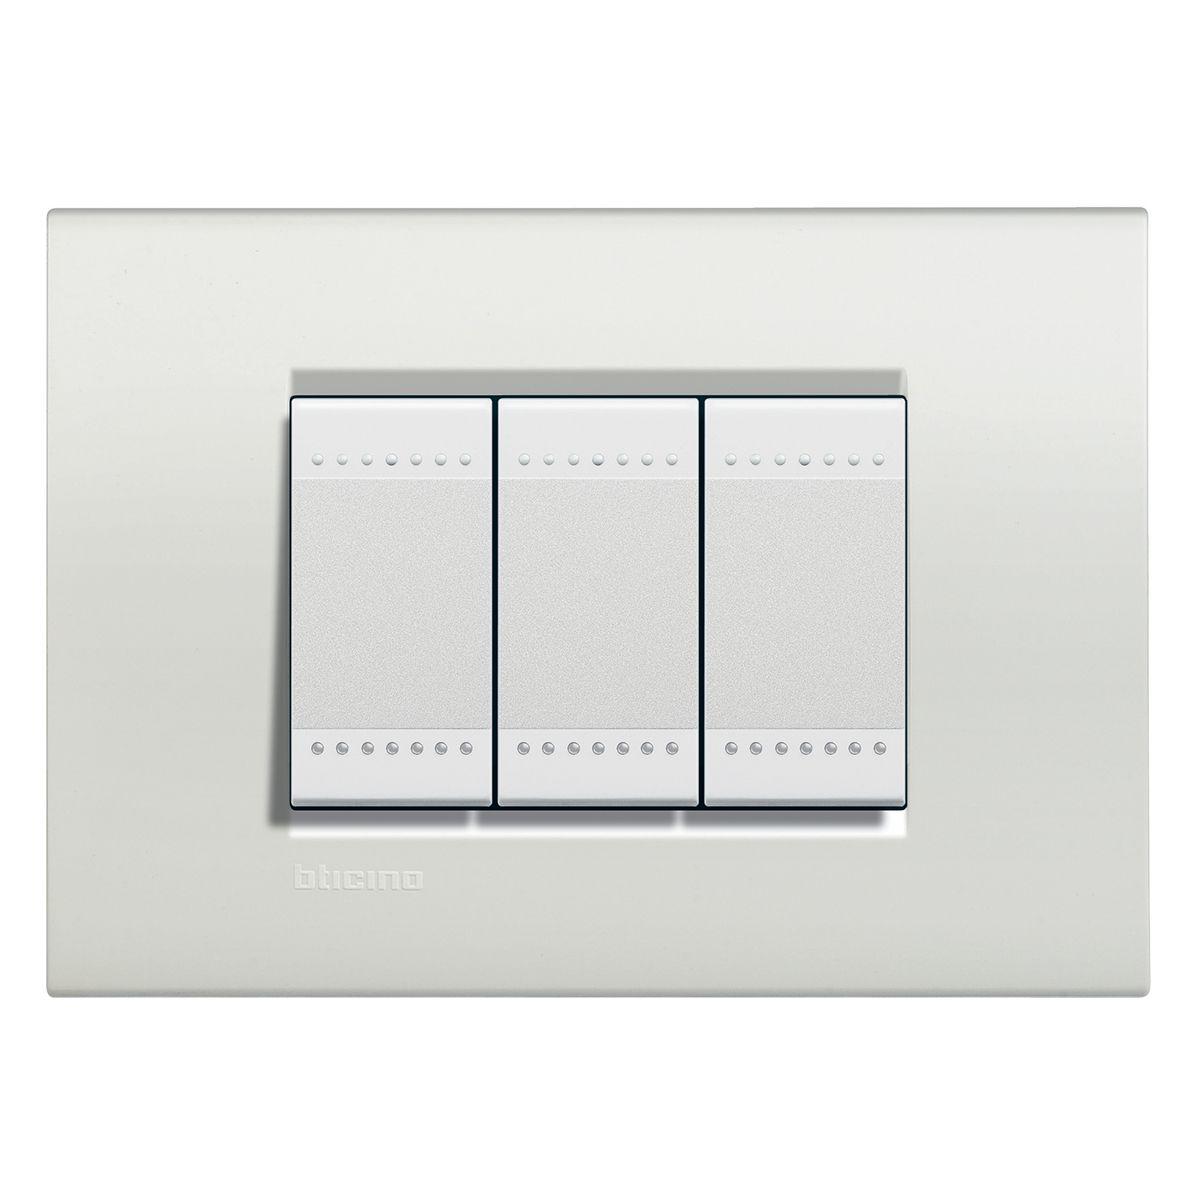 Interruptor bticino livinglight bianco 10 unidades na dimmershop - Interruttori living light ...